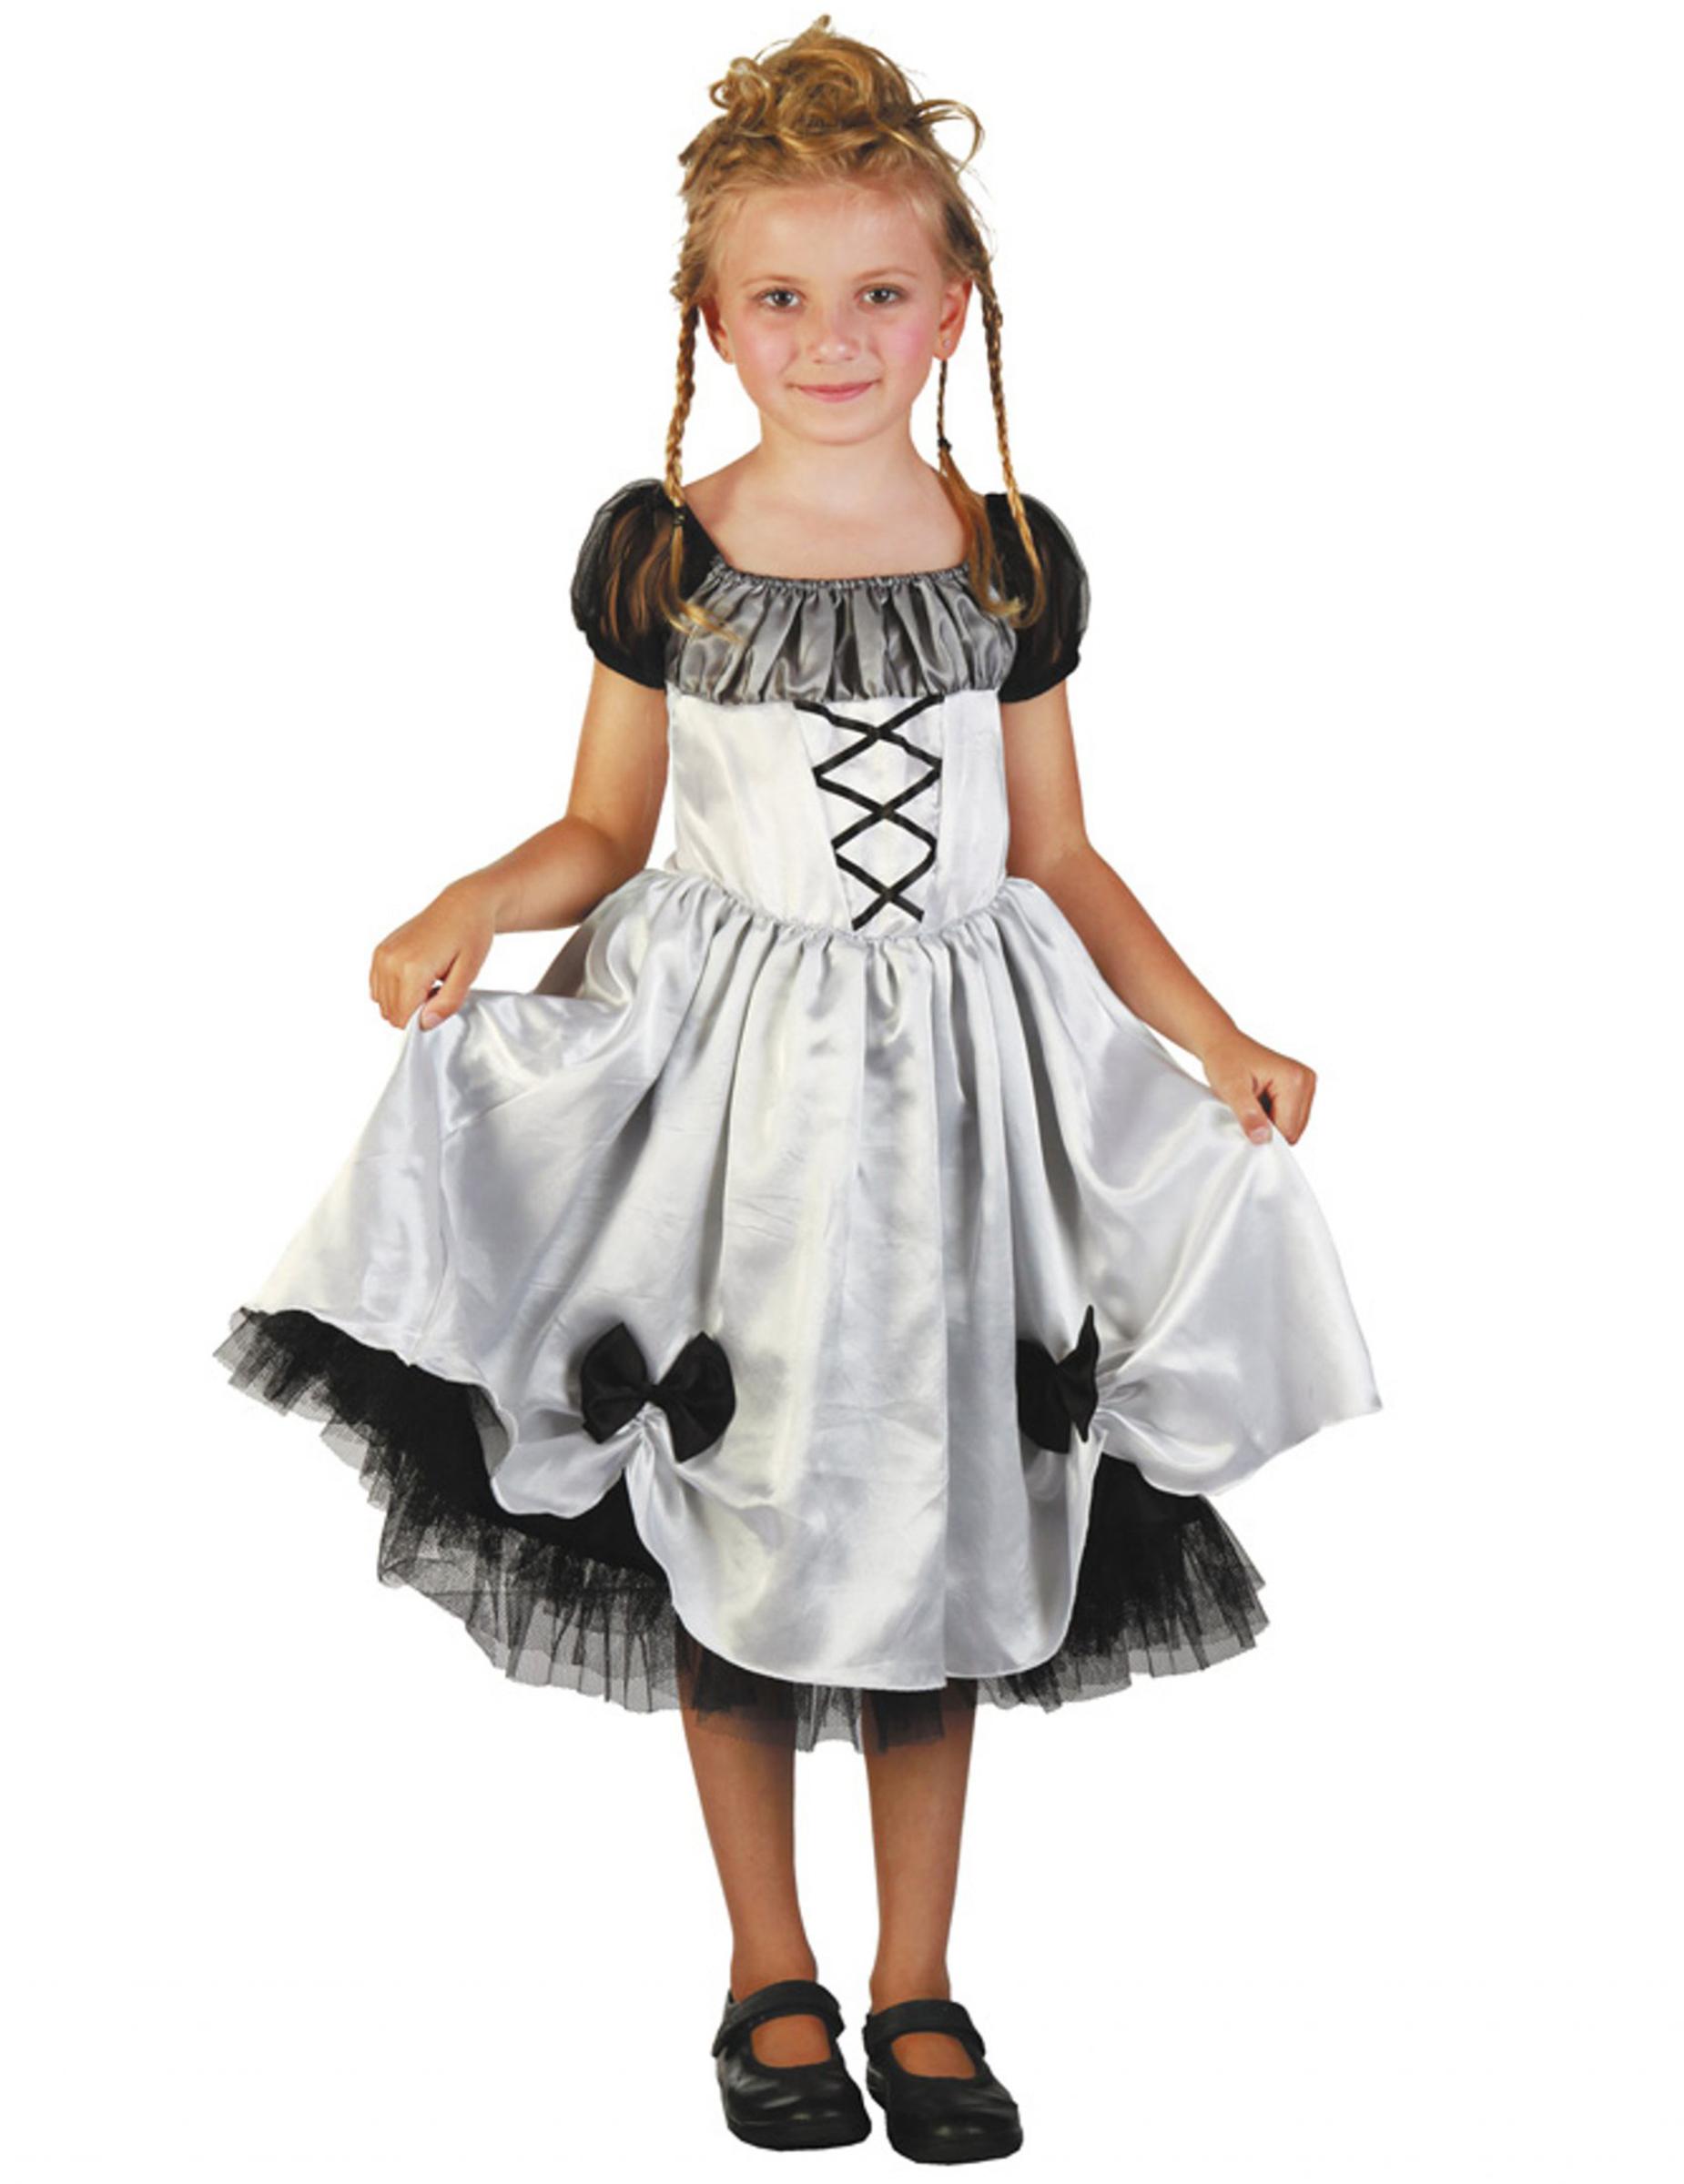 1dbaf362a800 Costume sposa bianco e nero bambina halloween  Costumi bambini